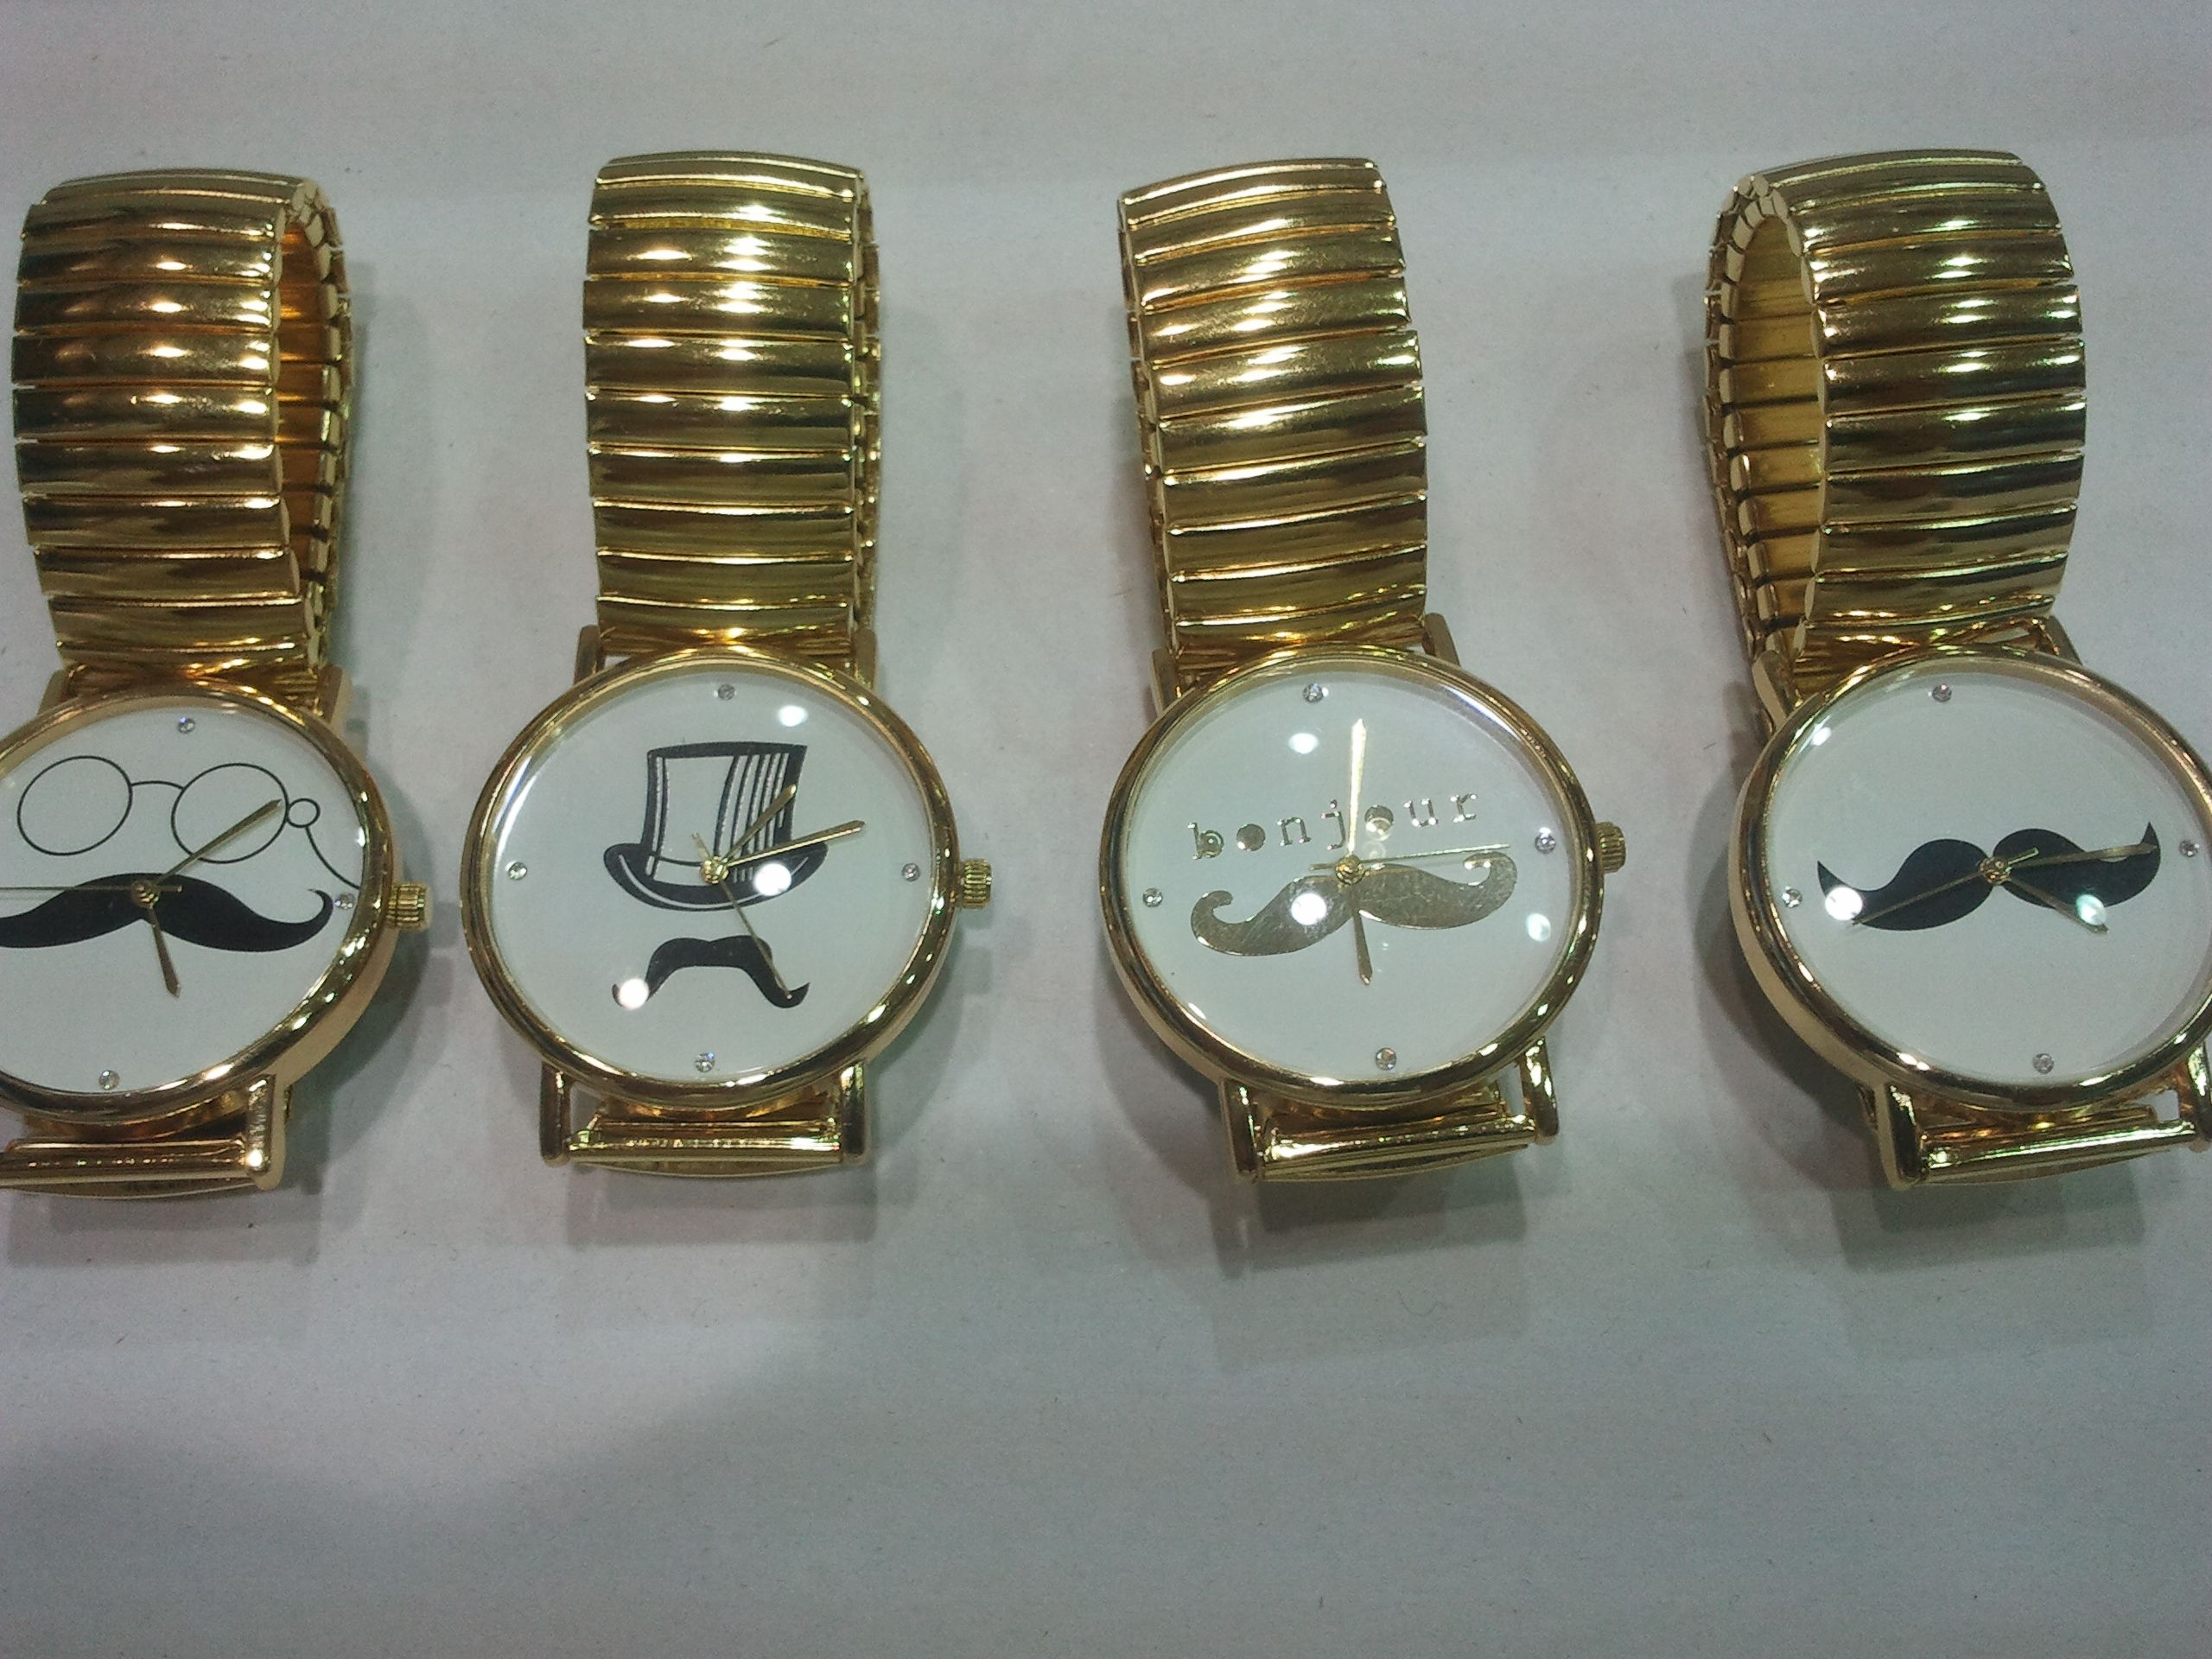 ساعة الشنب موستاش السعر للدرزن 360 ريال Bracelet Watch Accessories Watches